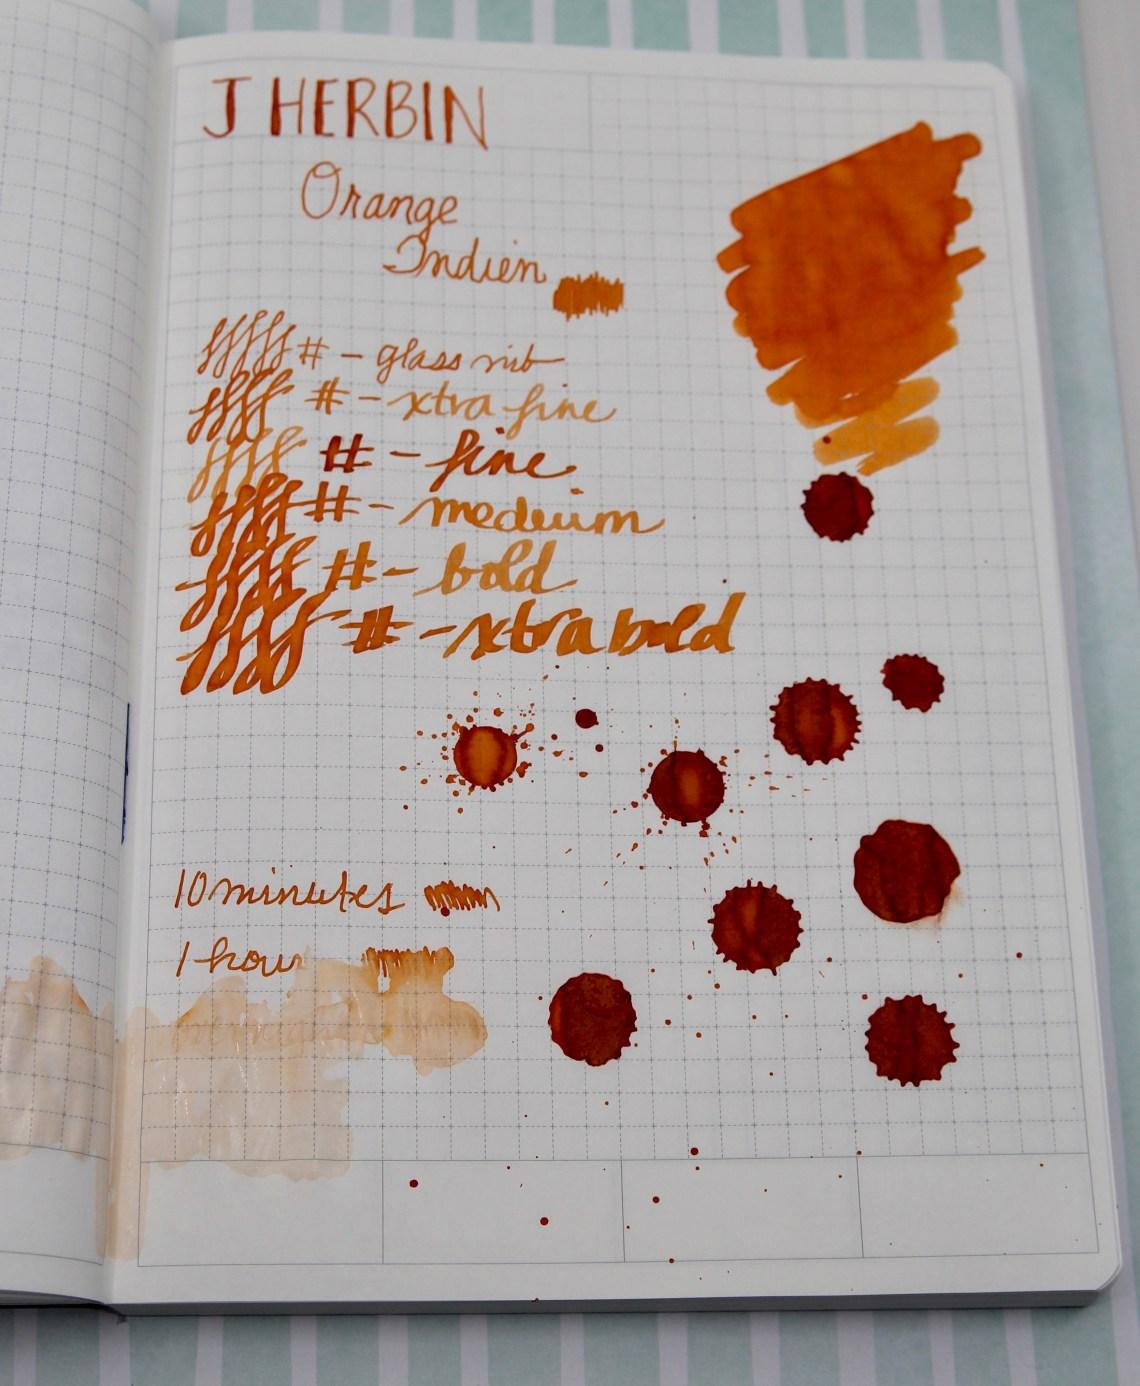 J. Herbin Orange Indien